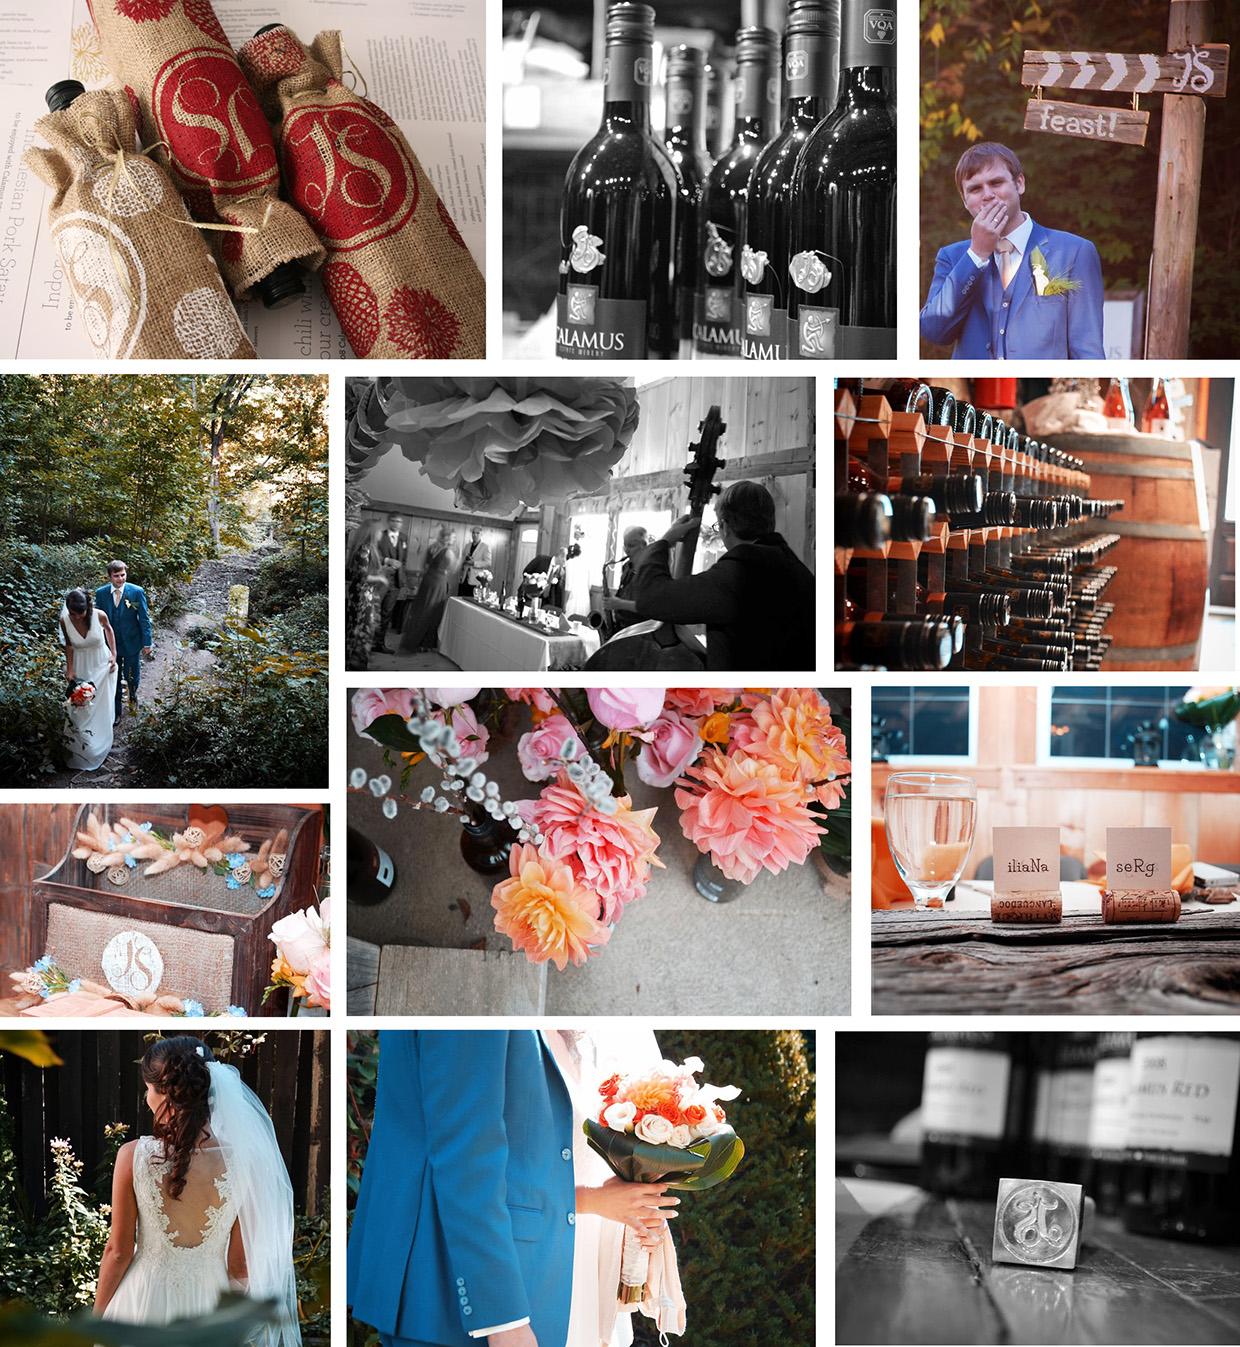 Details from Our Final Story Photos by Miriam Olszewski